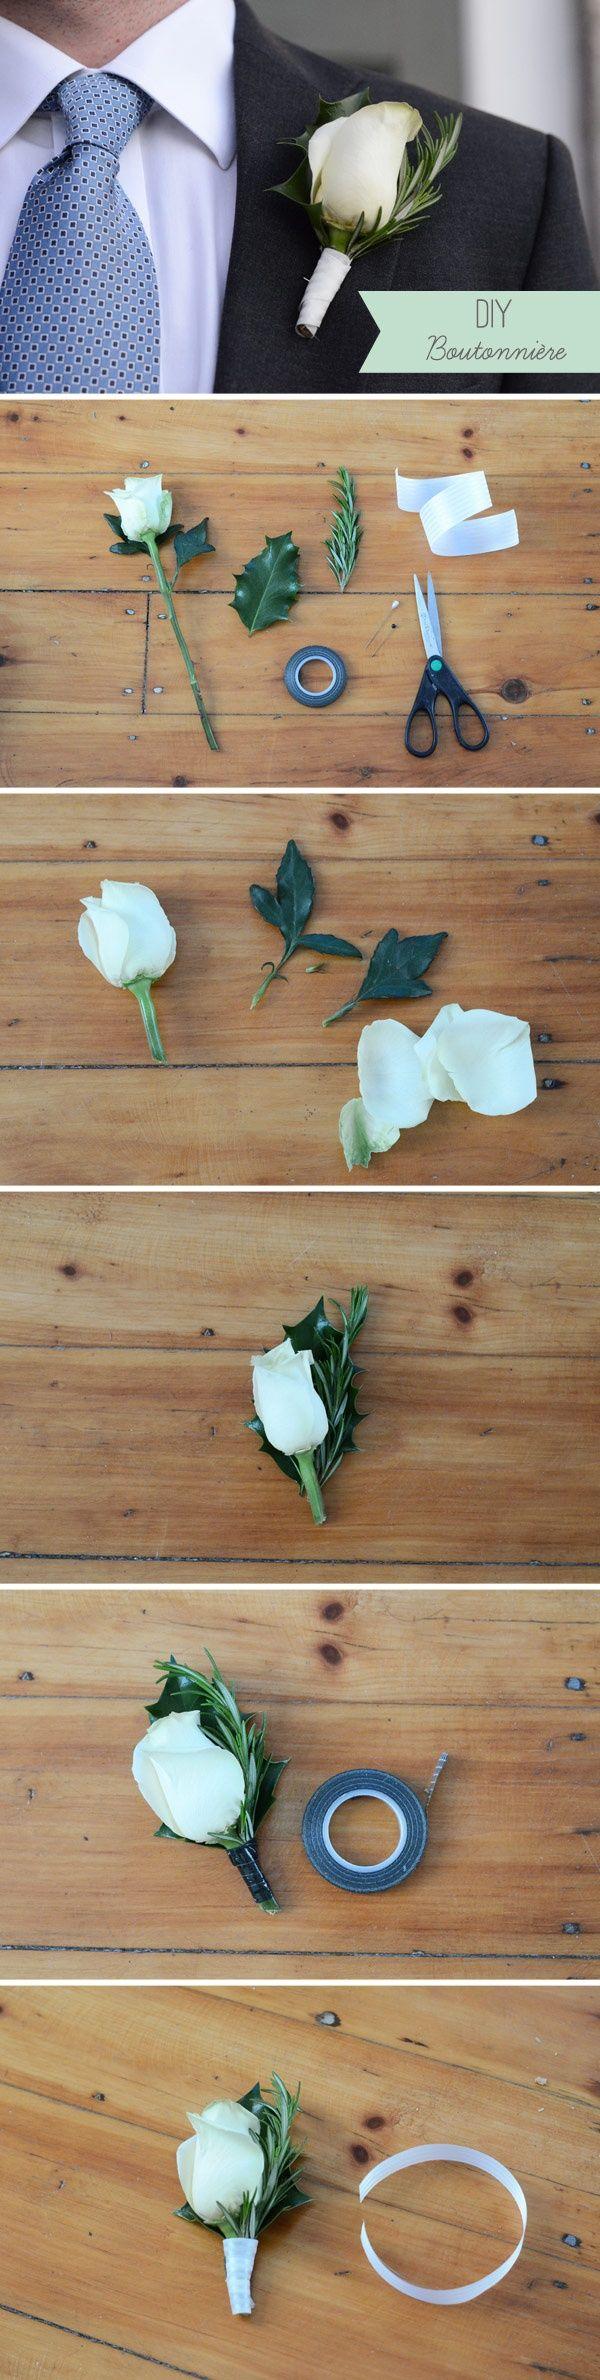 DIY Boutonniere – Super Simple Wedding DIY Floral Project #wedding #diy